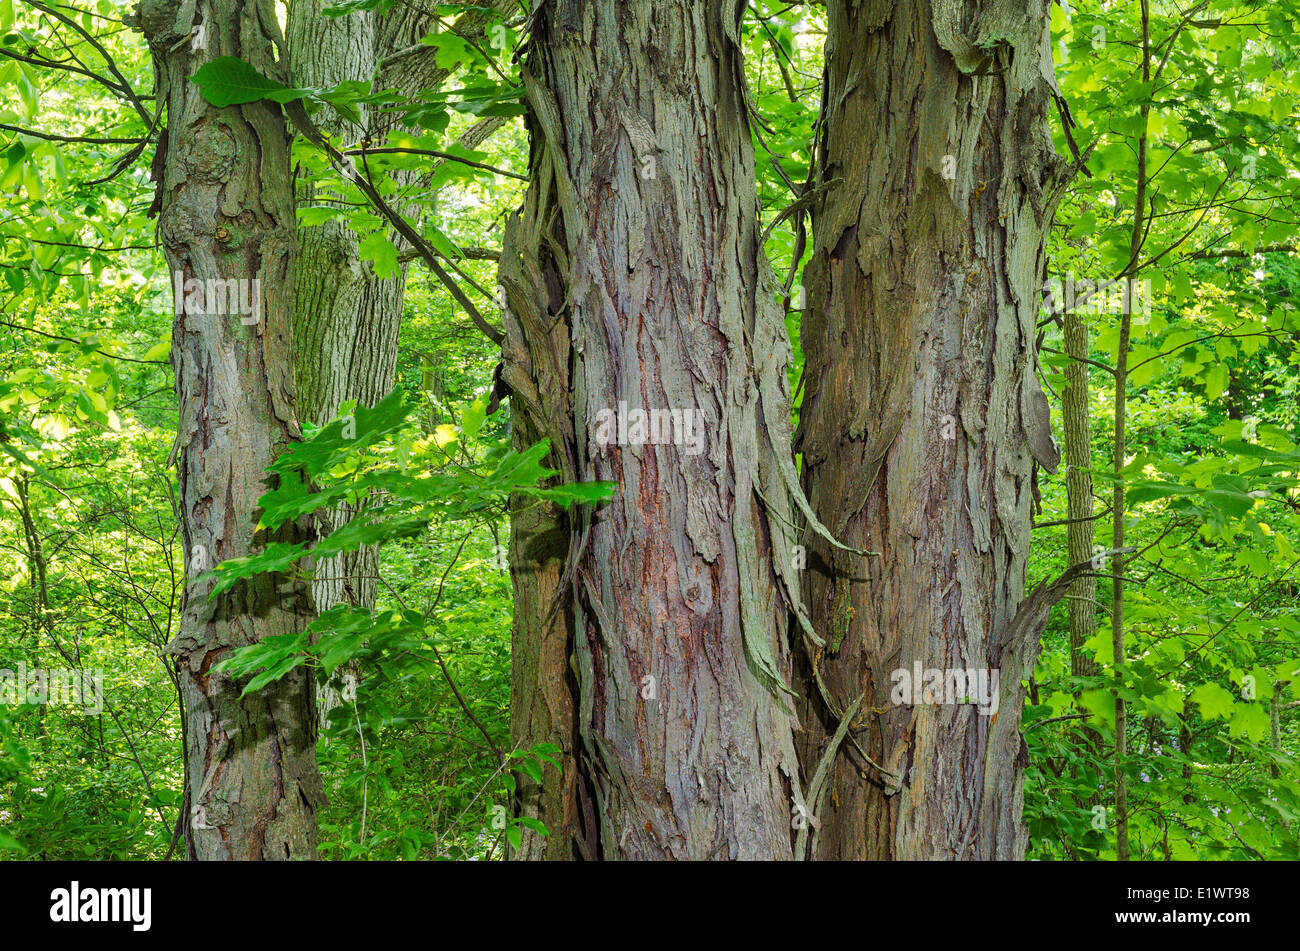 Shagbark Hickory (Carya ovata) in Carolinian Forest. Ruthven Park National Historic Site, Ontario. Canada. - Stock Image